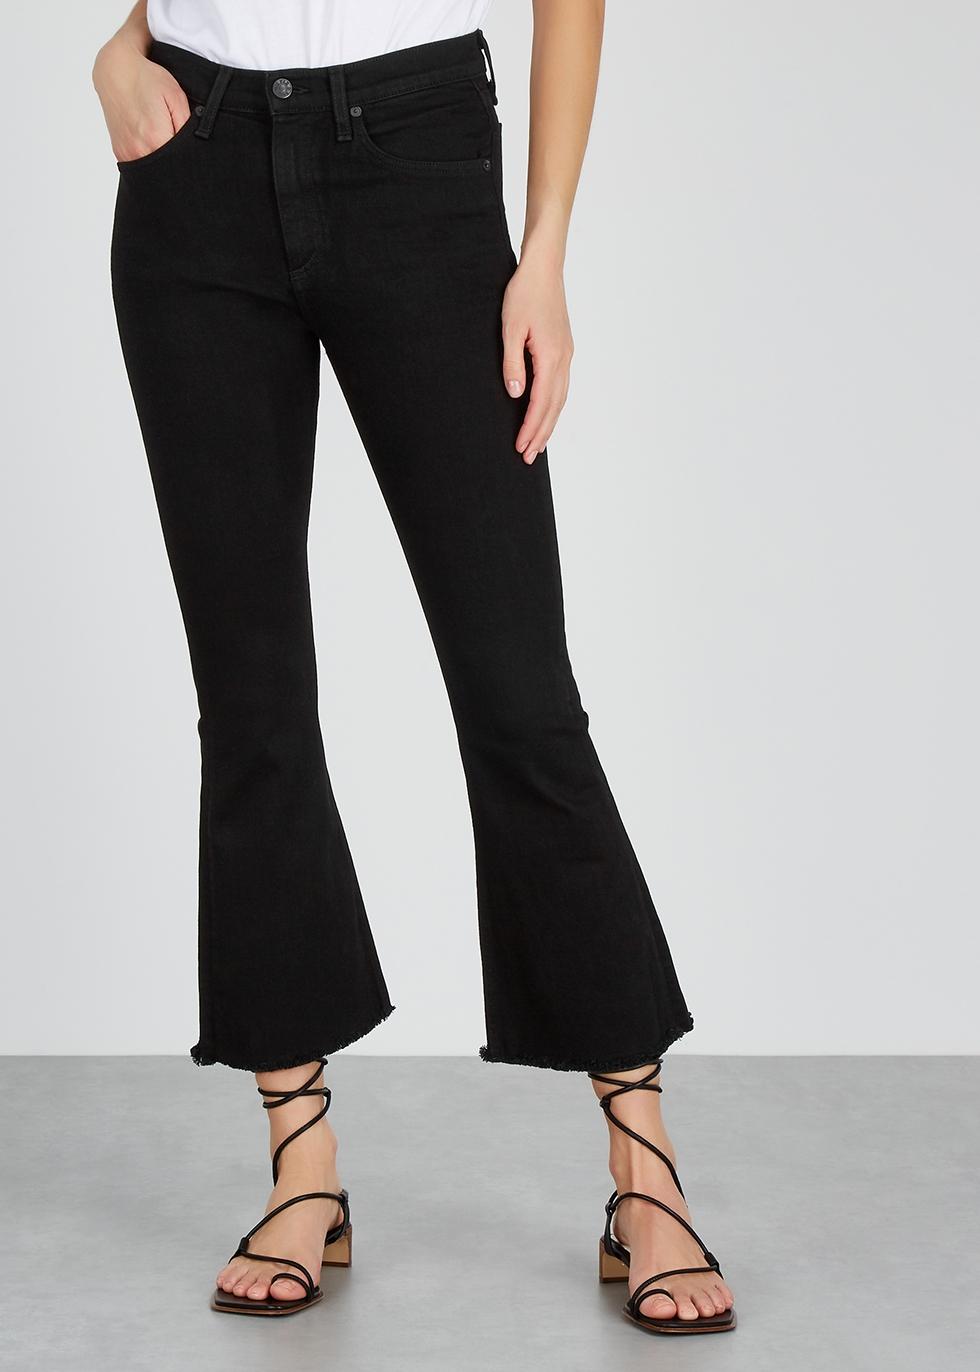 Black kick-flare jeans - rag & bone